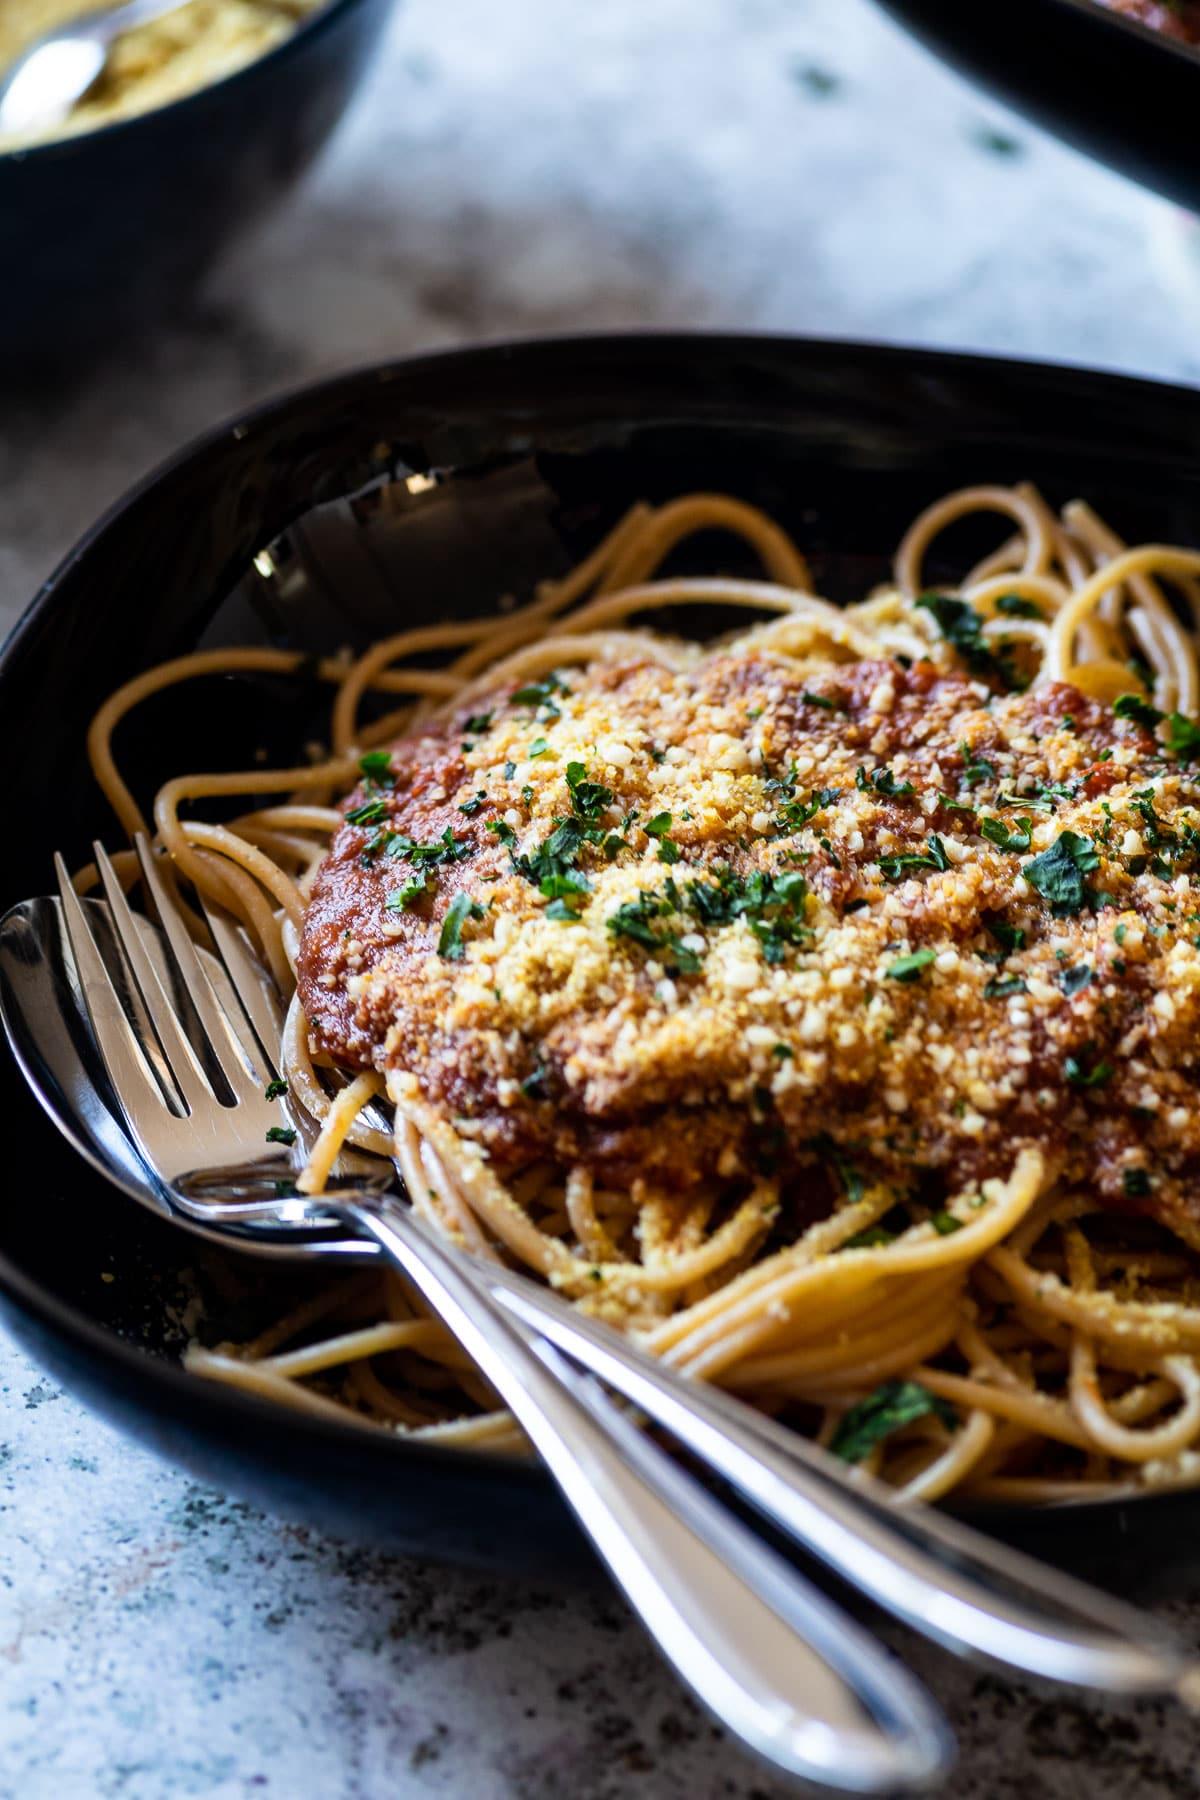 Spaghetti mit veganer Bolognese-Sauce und veganem Parmesan